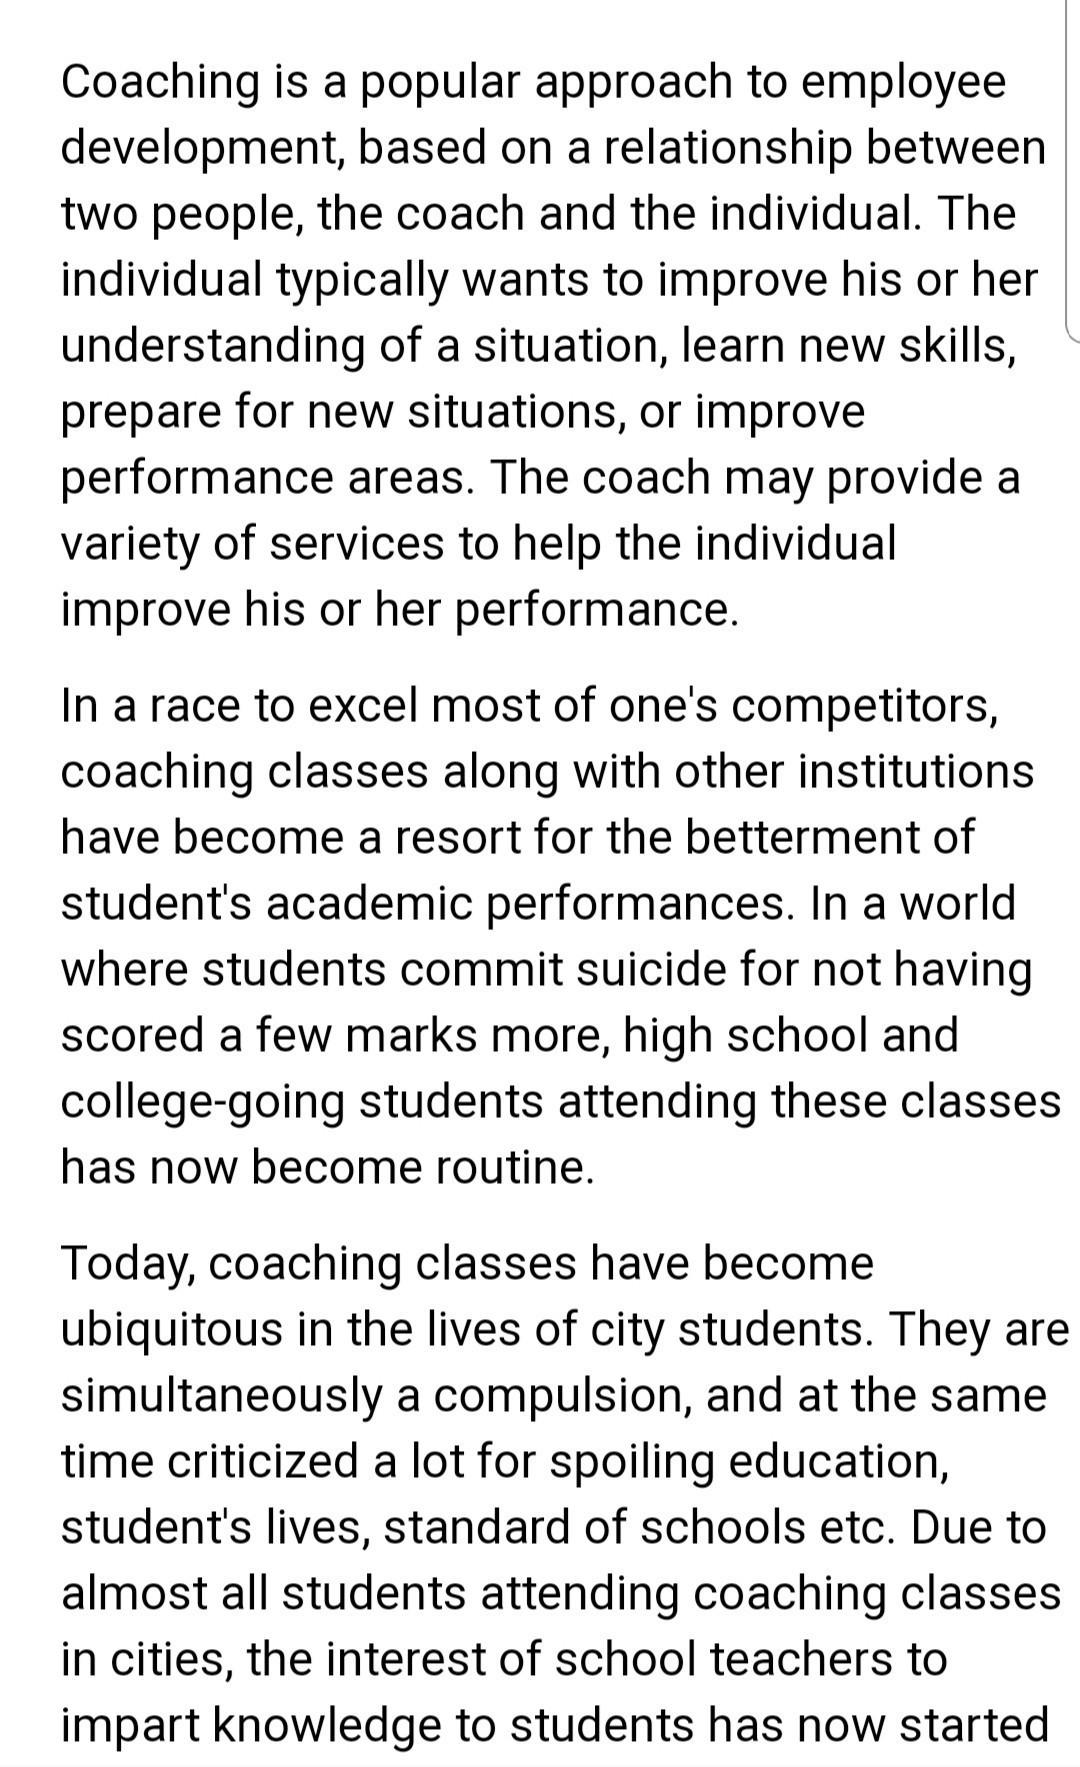 a short paragraph on education